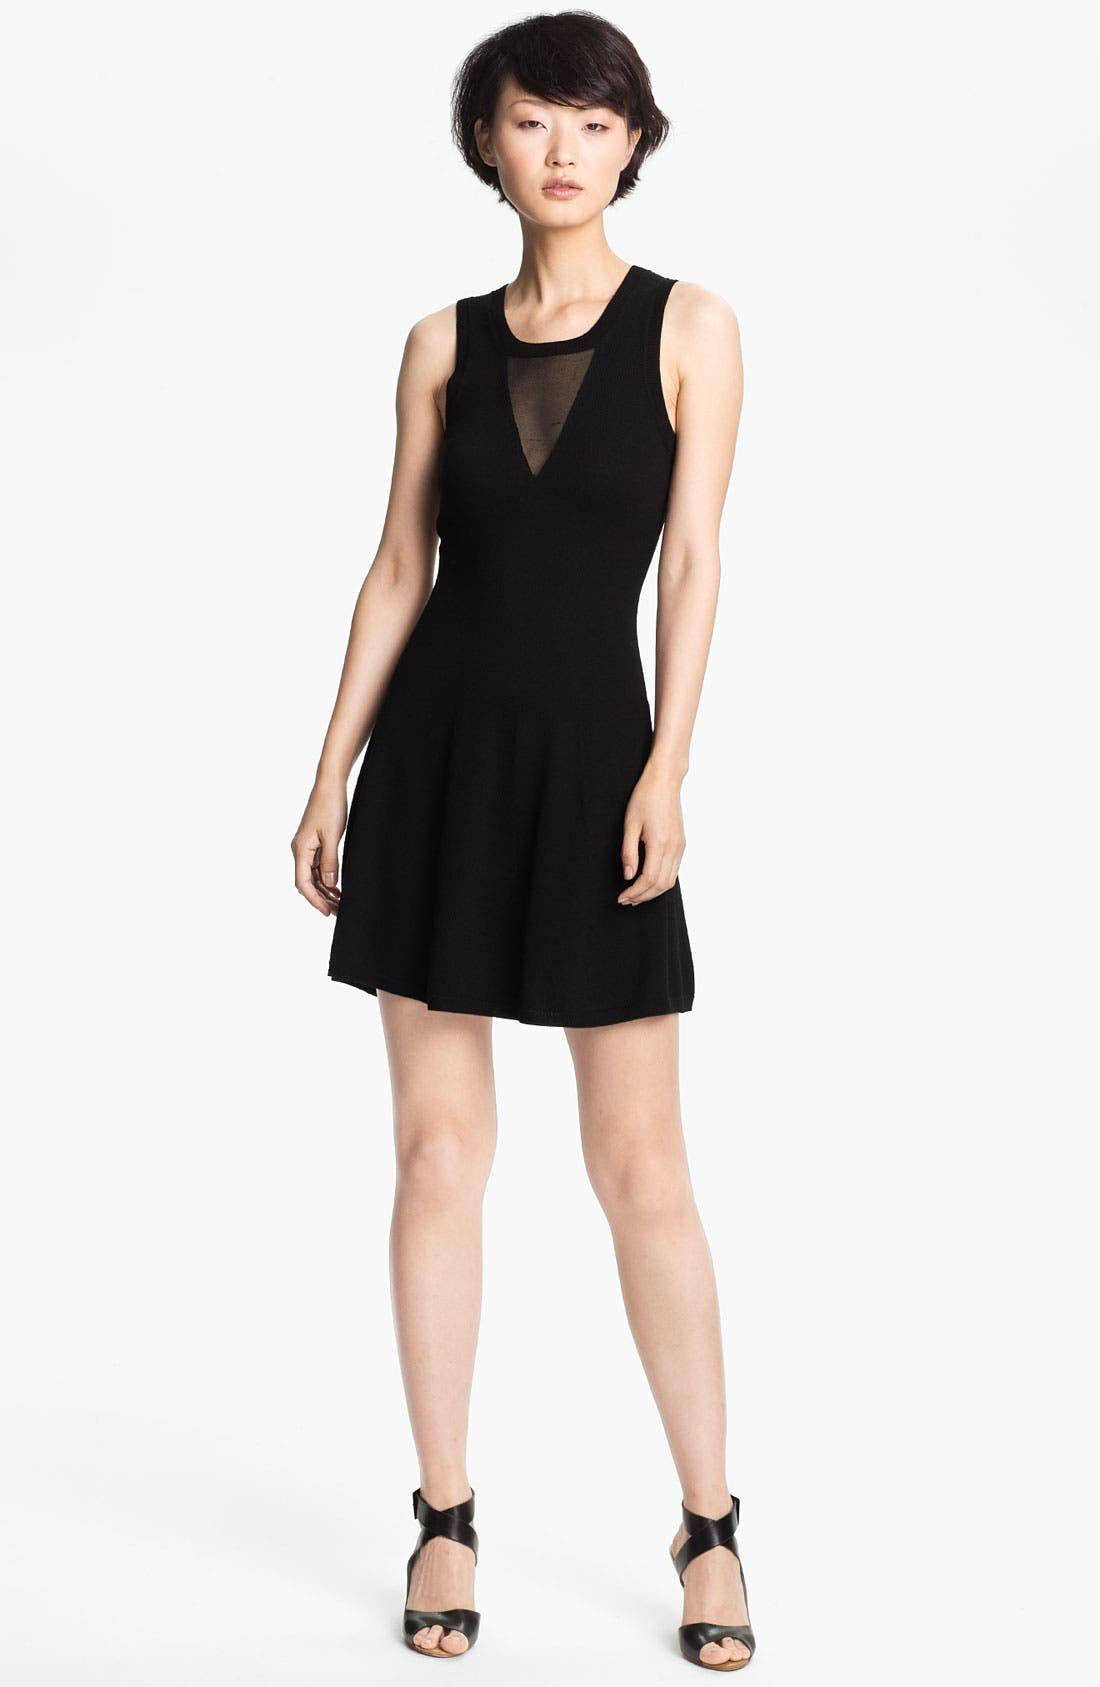 Main Image - 3.1 Phillip Lim Sheer Detail Knit Dress